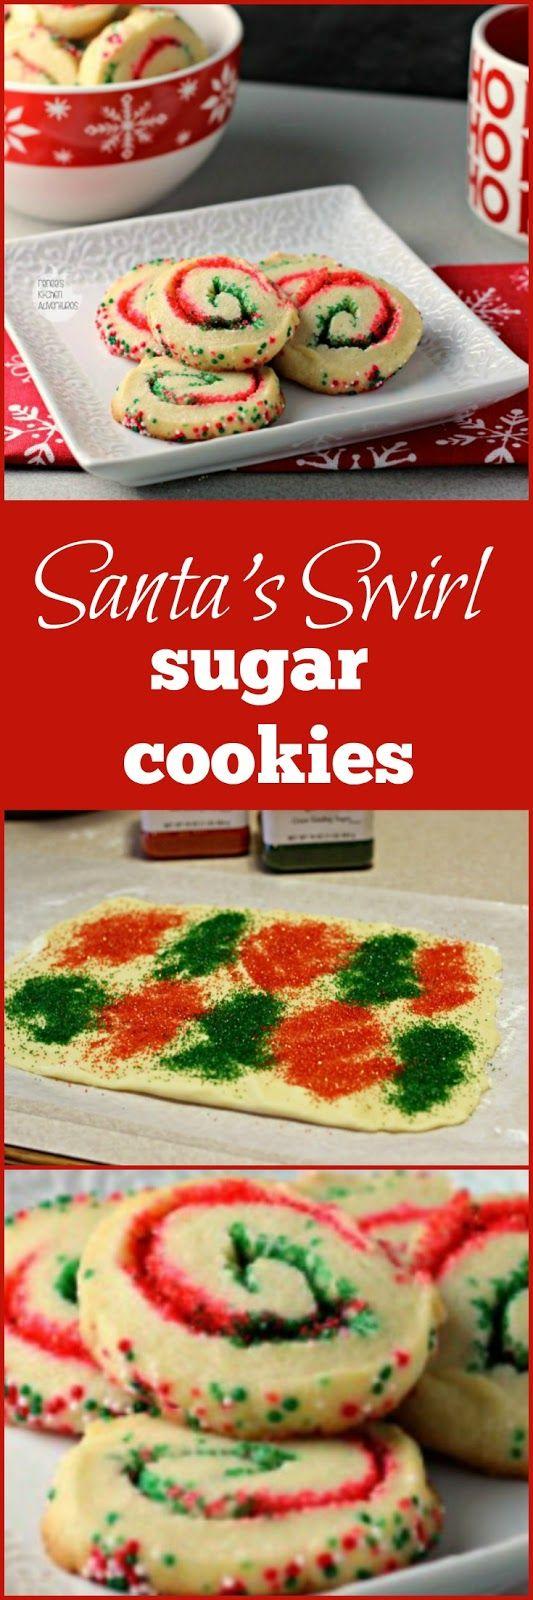 Santa's Swirl Sugar Cookies | by Renee's Kitchen Adventures - Easy holiday…